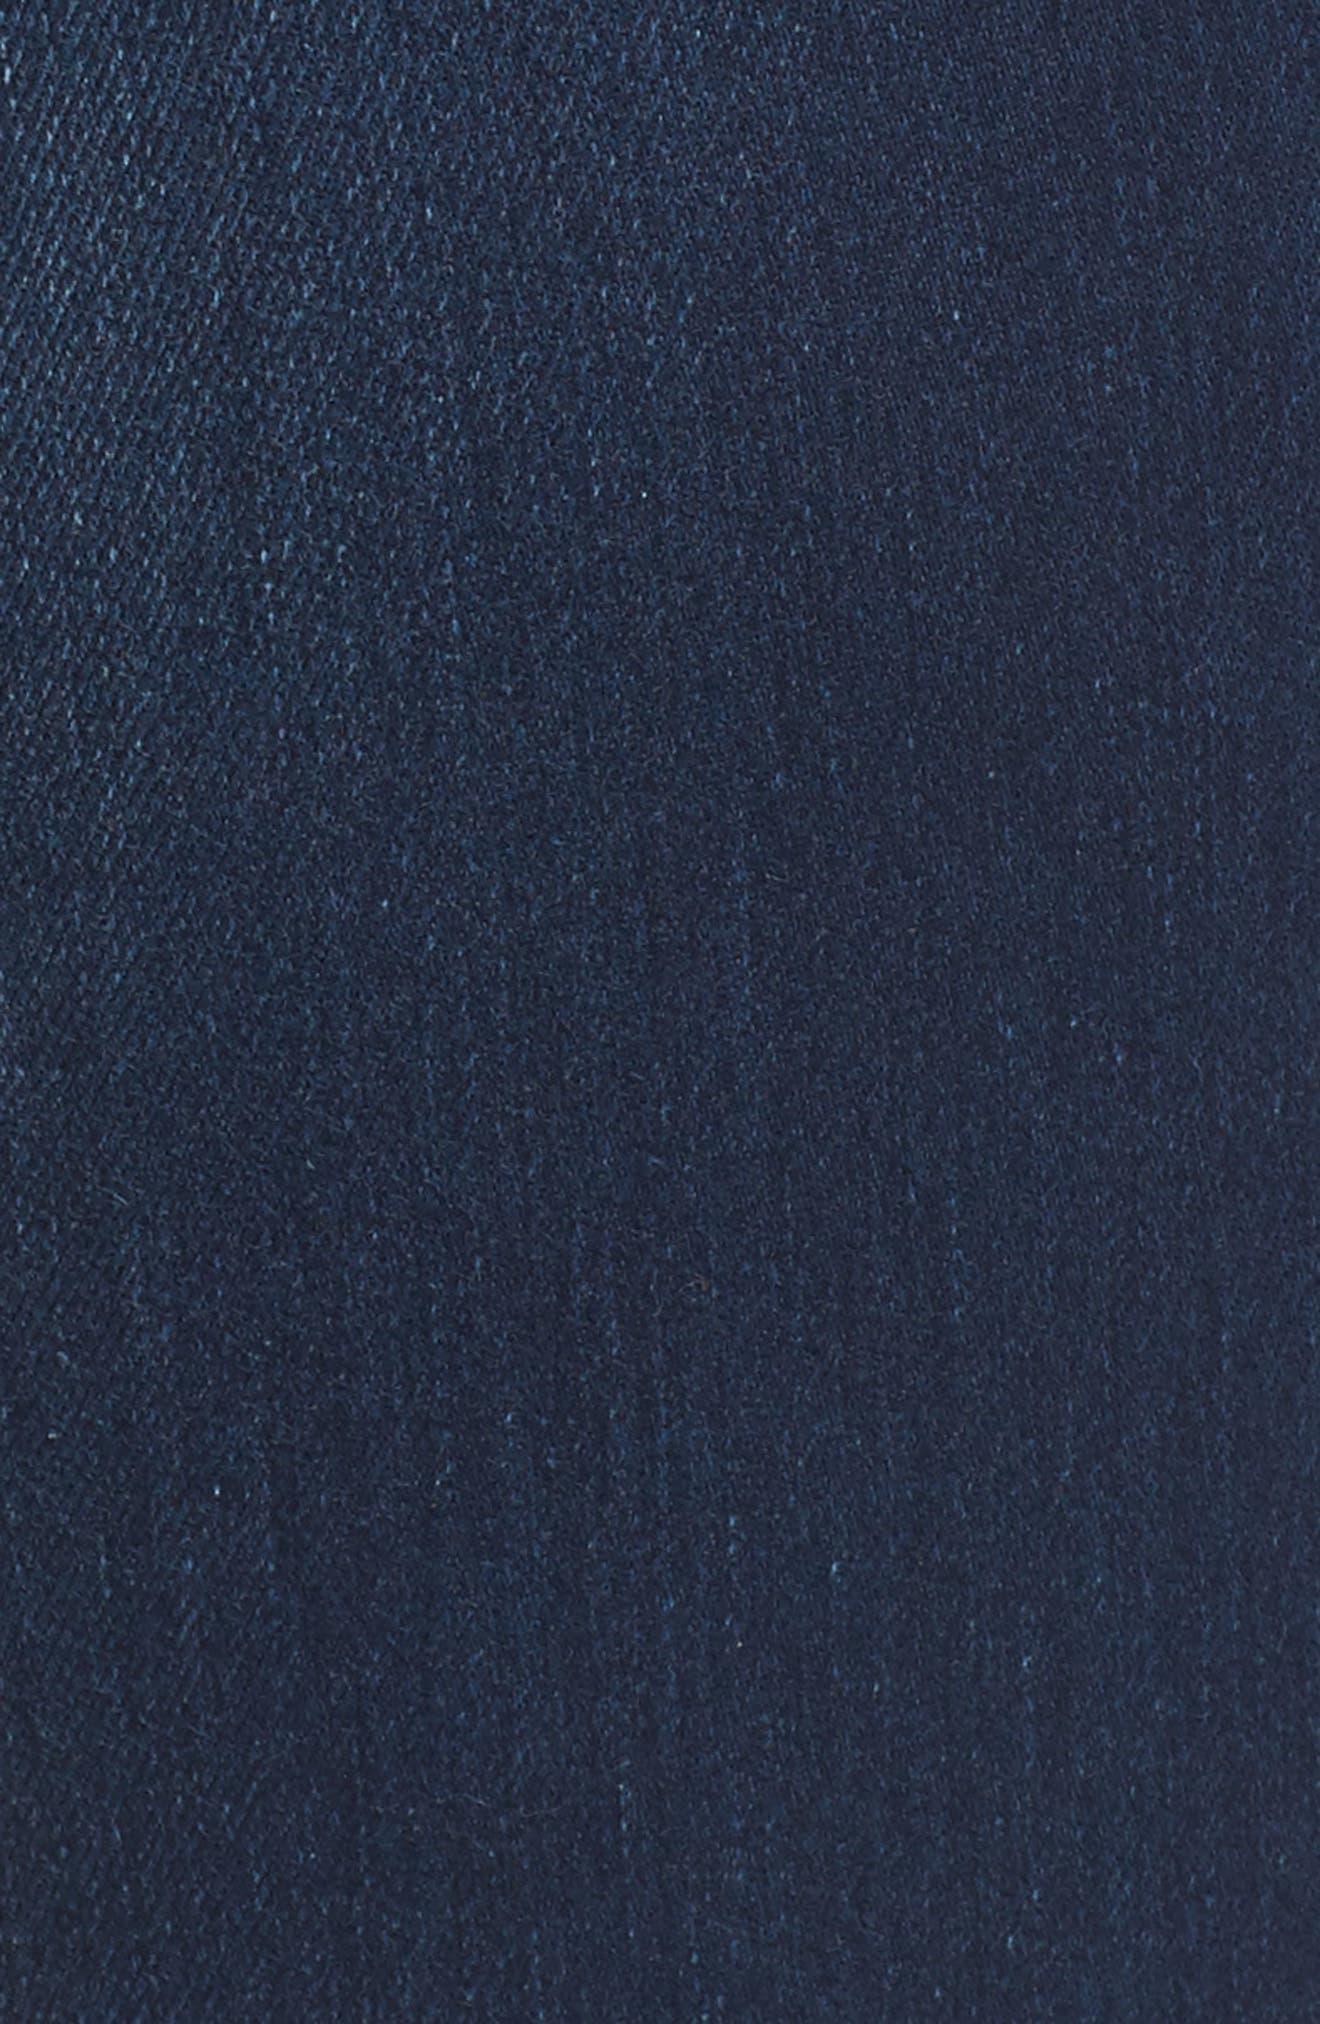 Becca Bootcut Jeans,                             Alternate thumbnail 5, color,                             Lands End Indigo